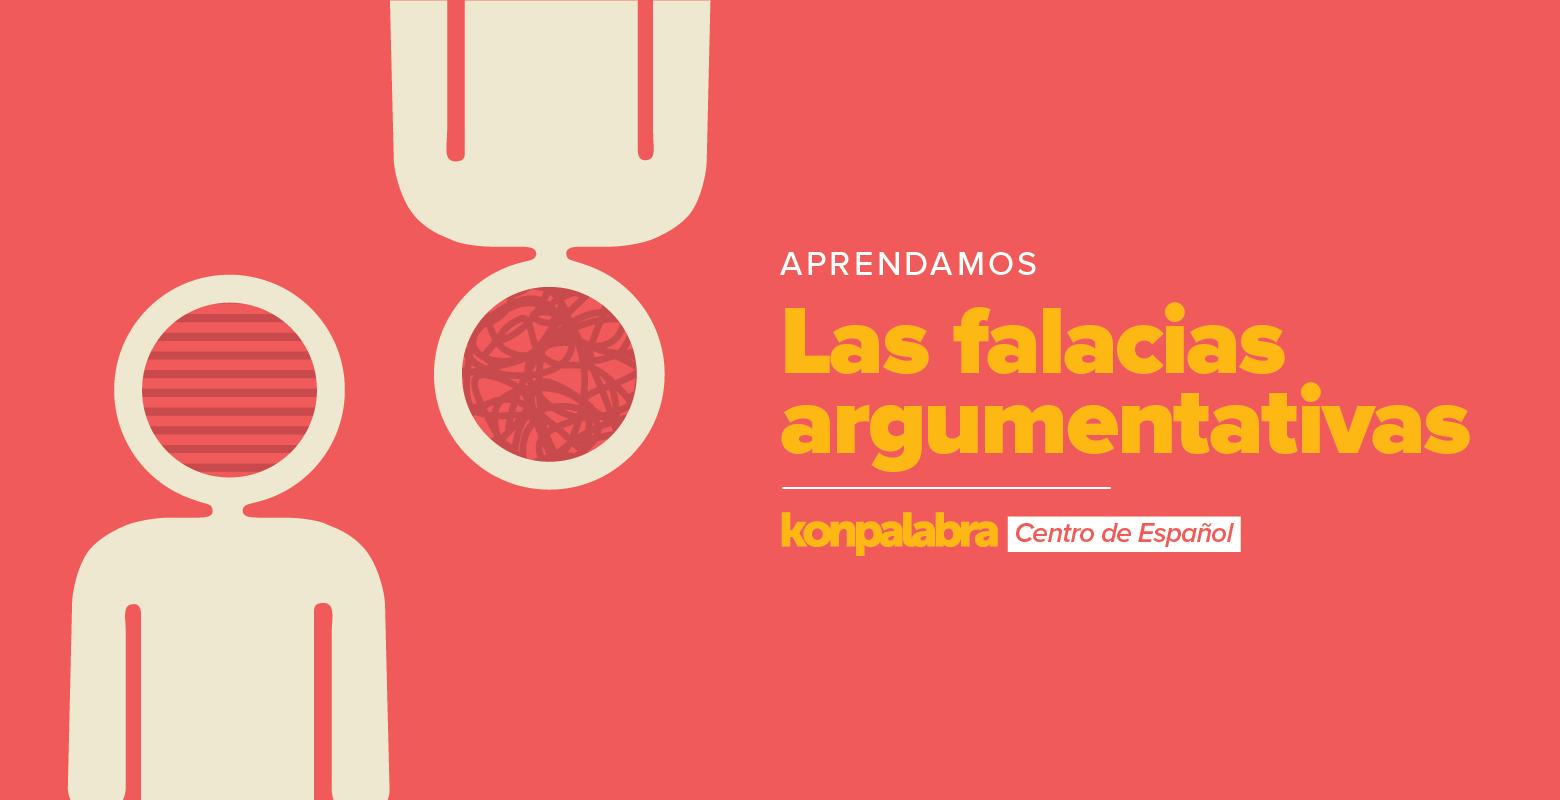 Las falacias argumentativas